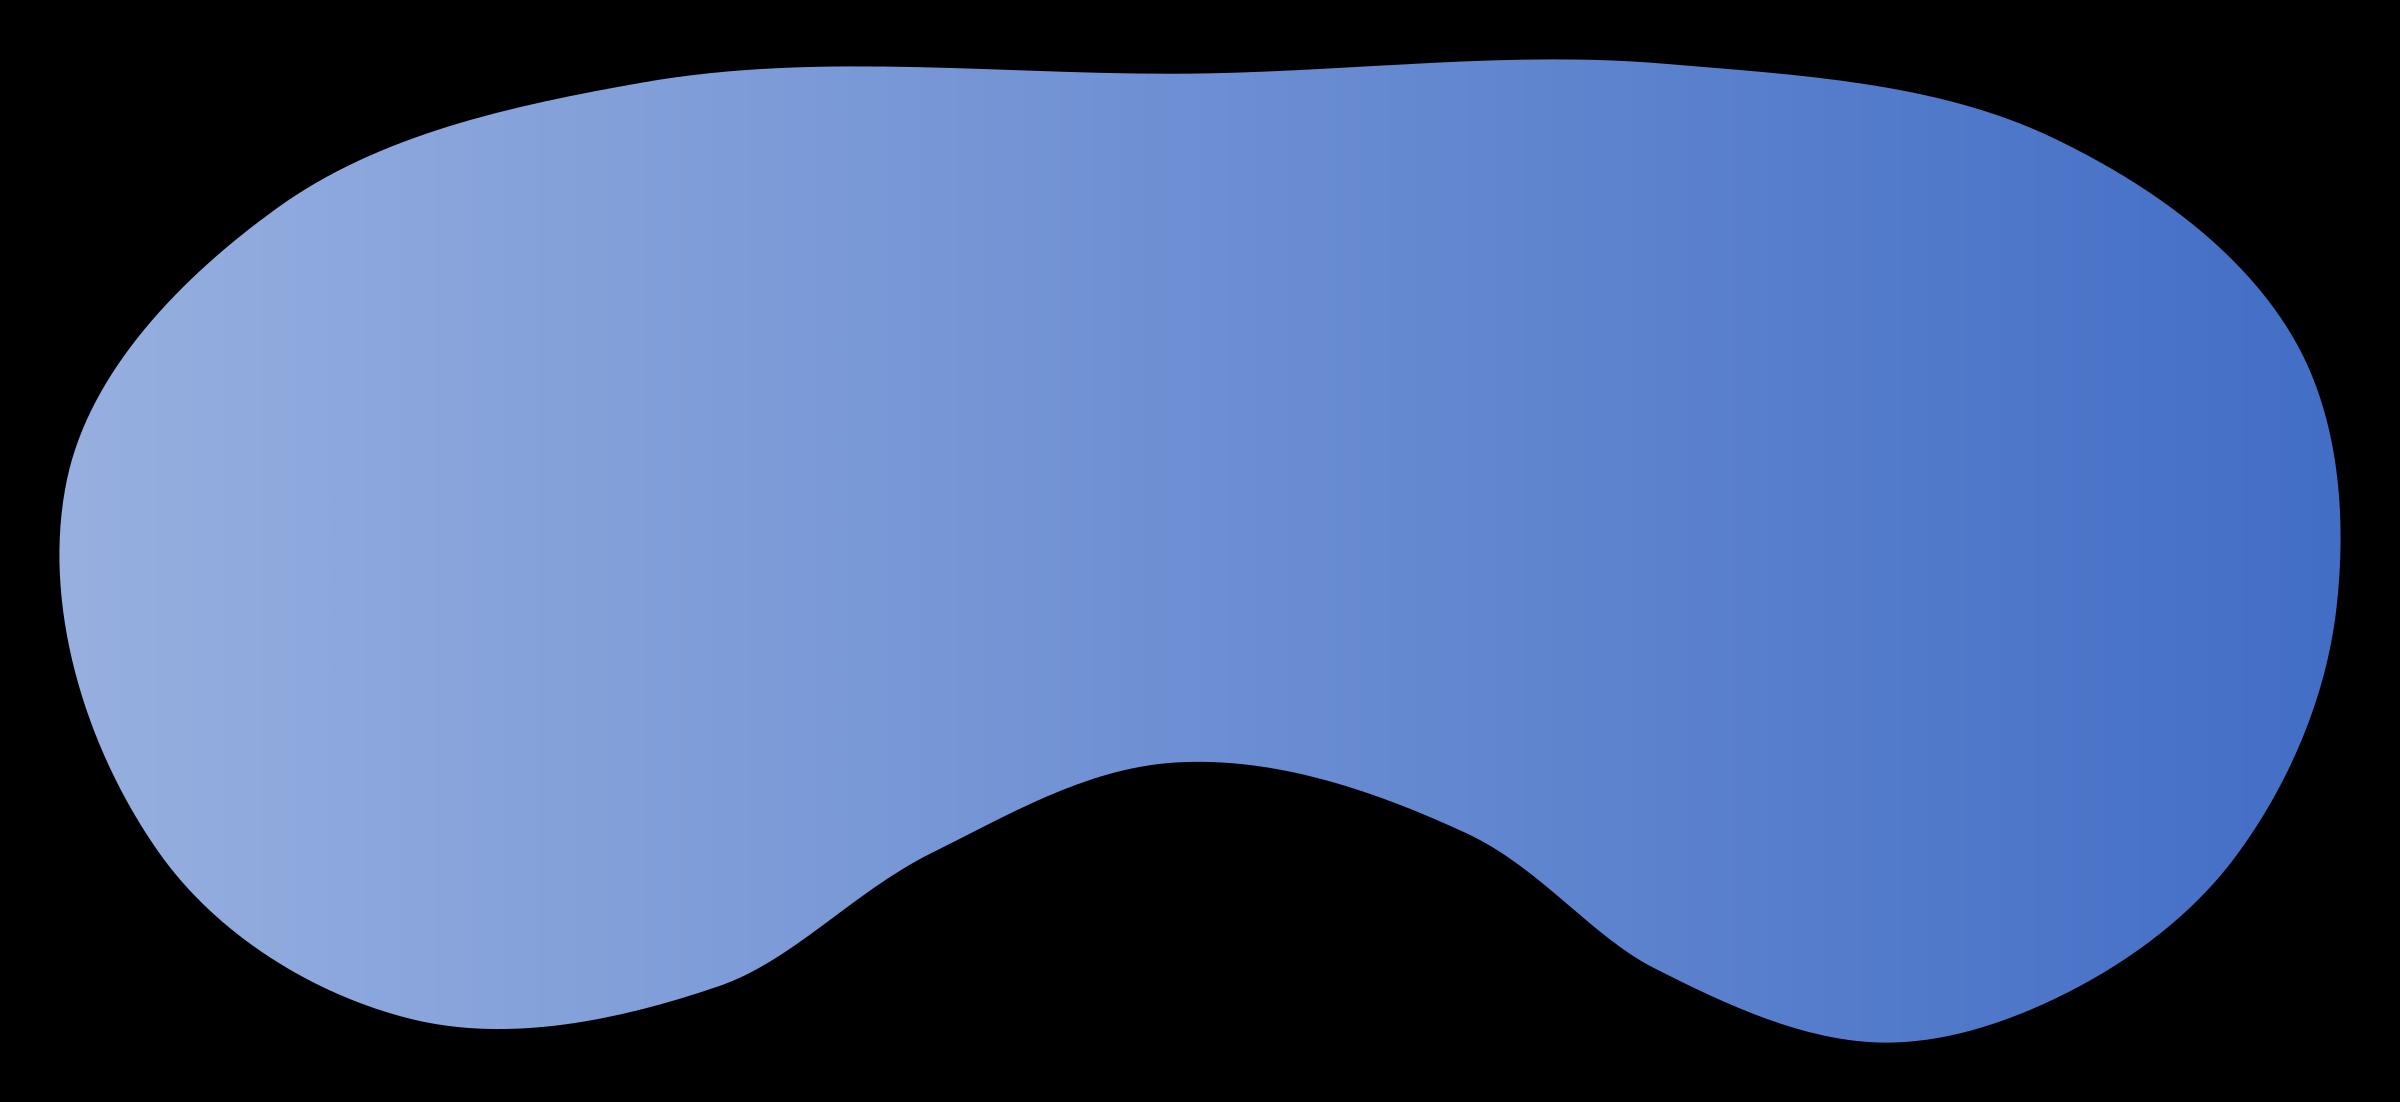 Clipart Eye Mask